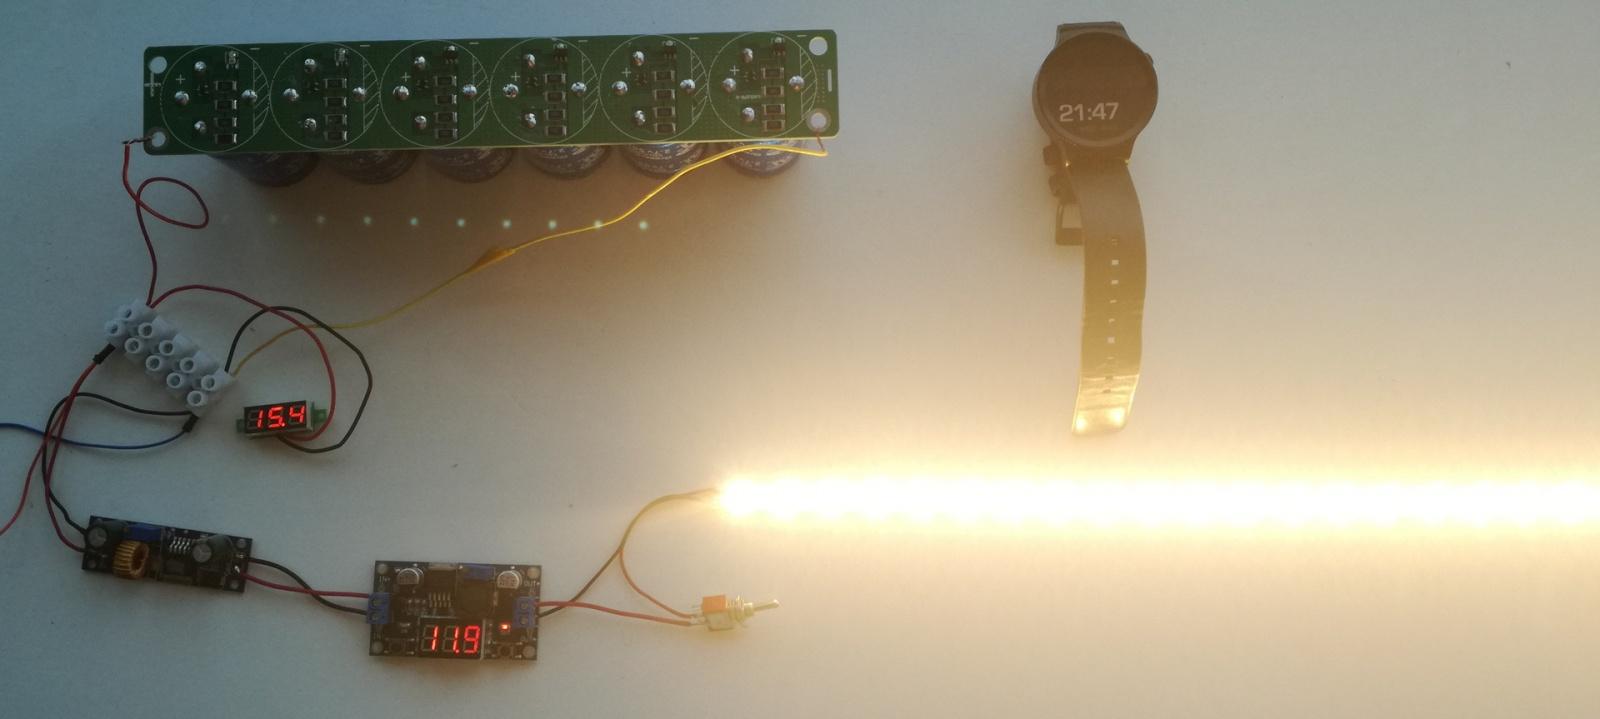 Солнечная батарея на балконе: тестирование батареи ионисторов - 6